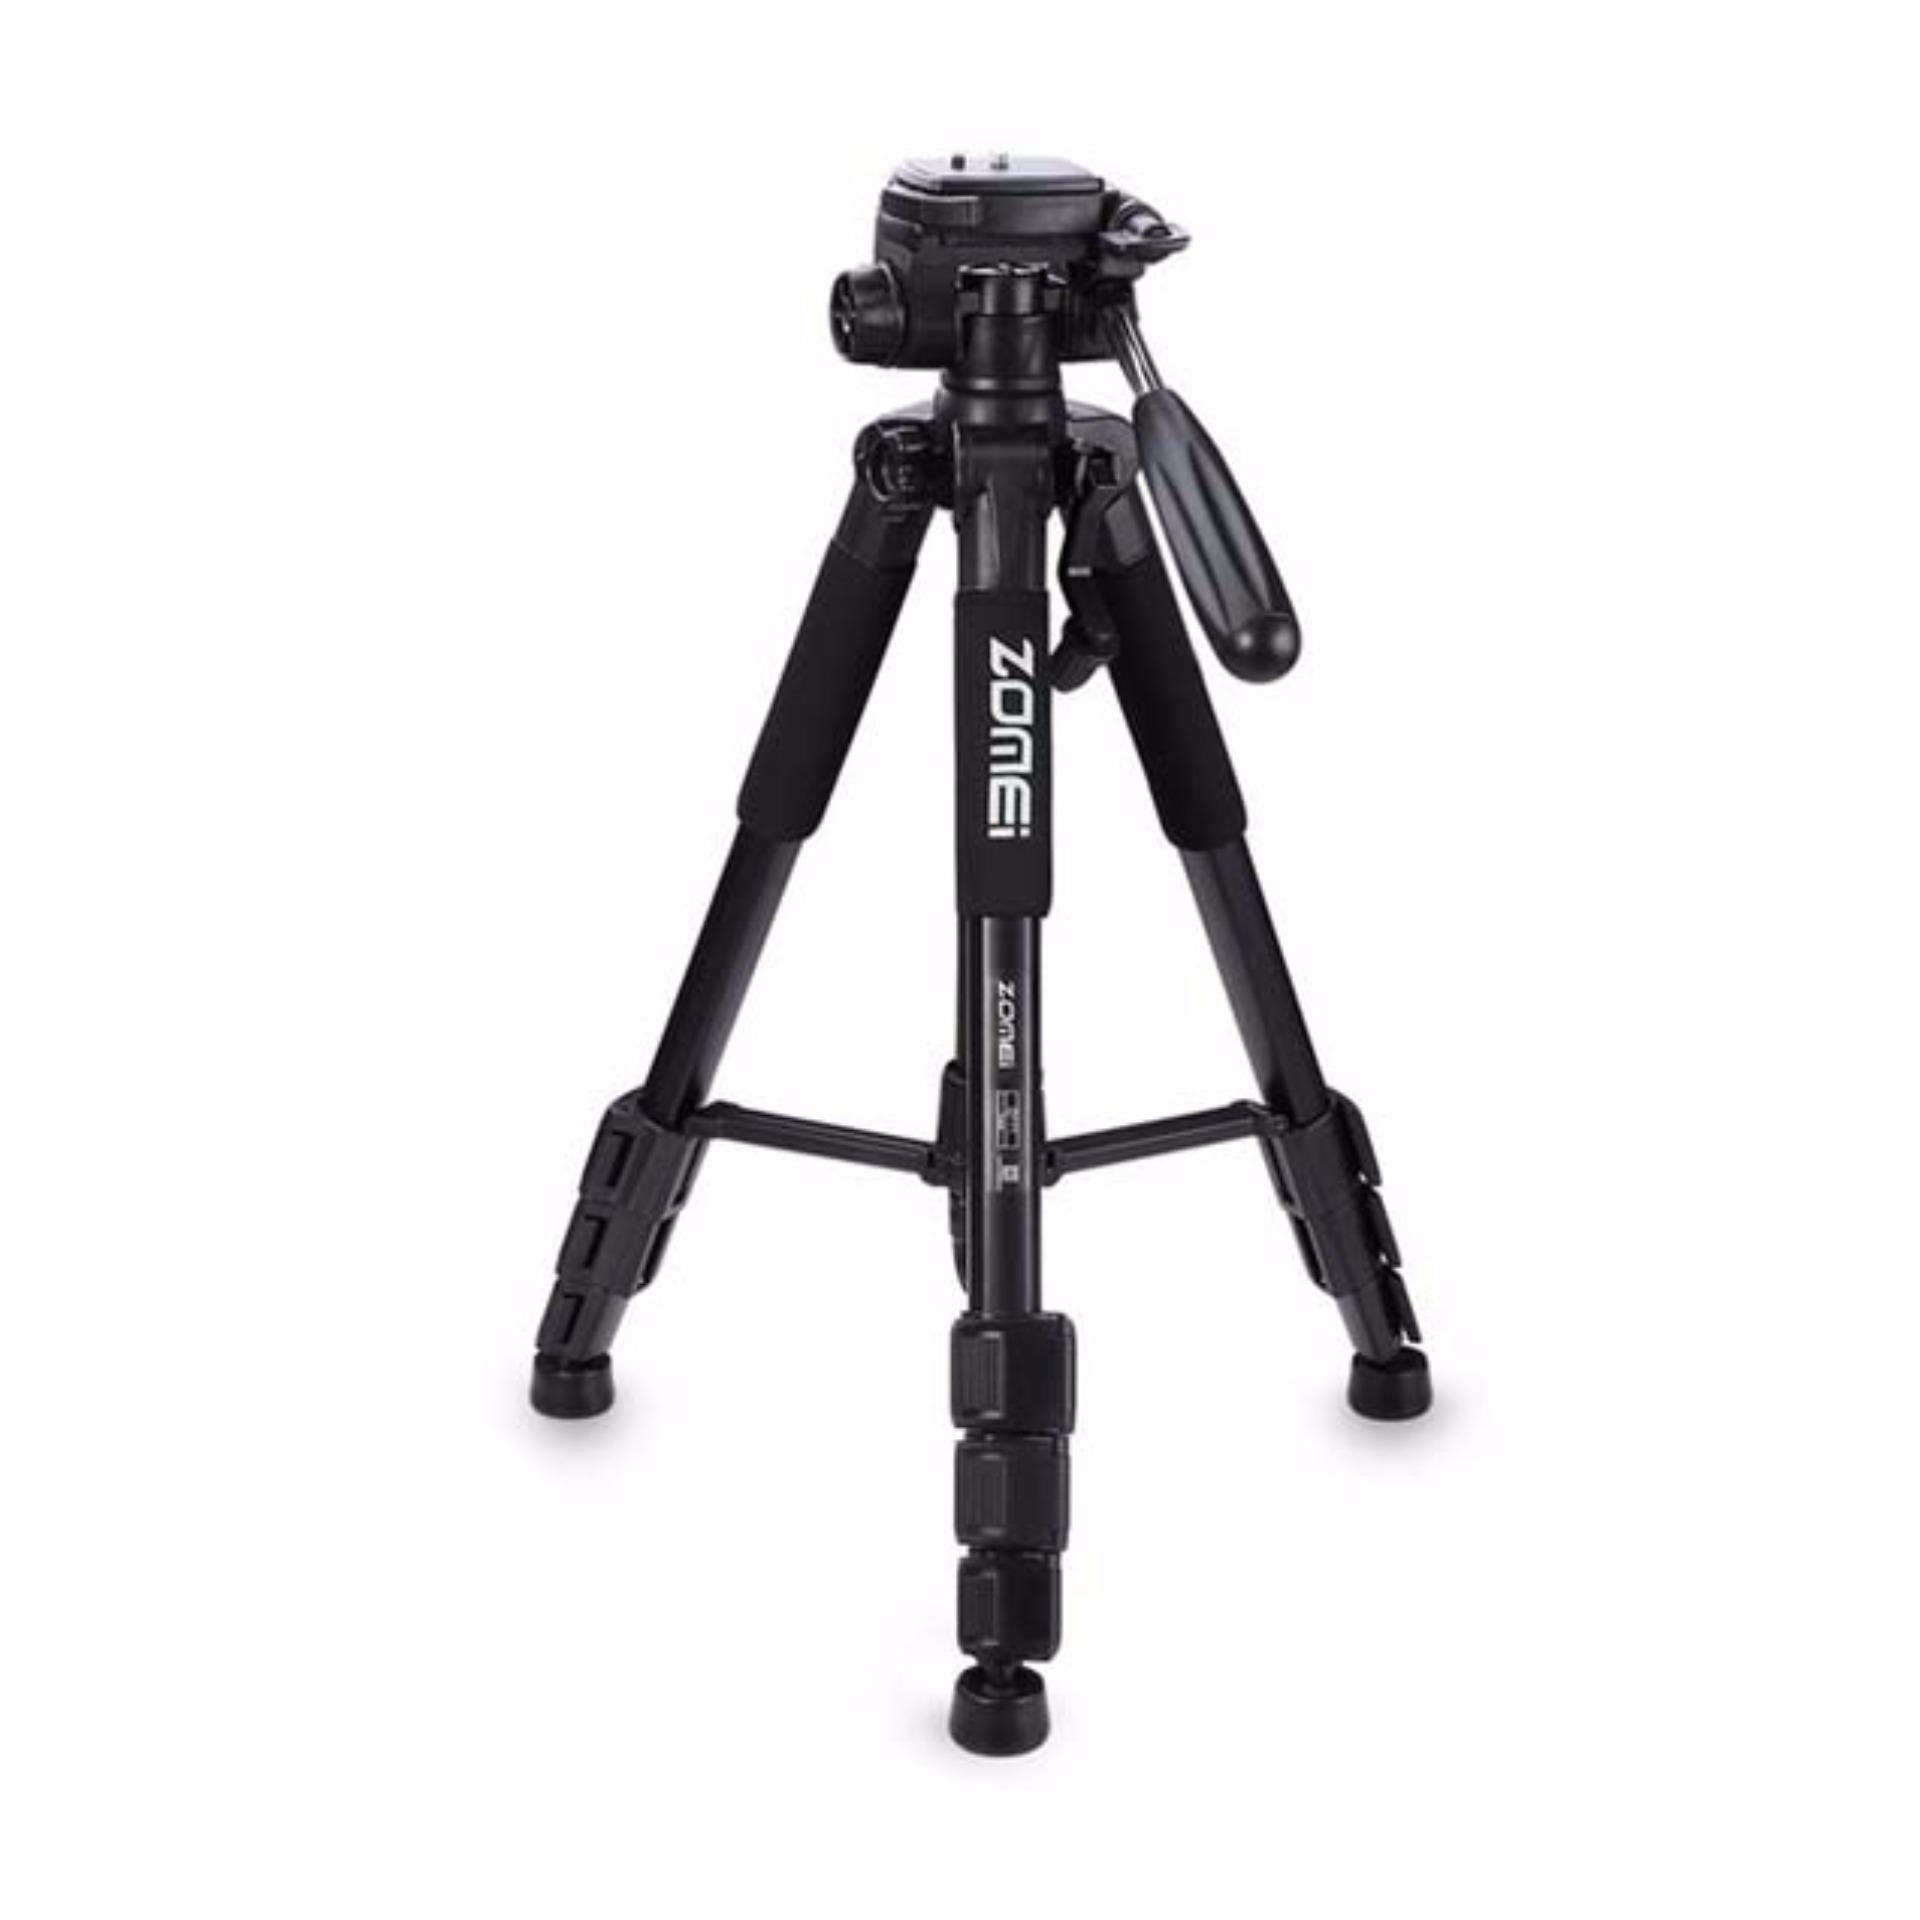 Zomei Q111 Portable Pro Camera Travel Tripod Lightweight Stand for DSLR Morroless camera